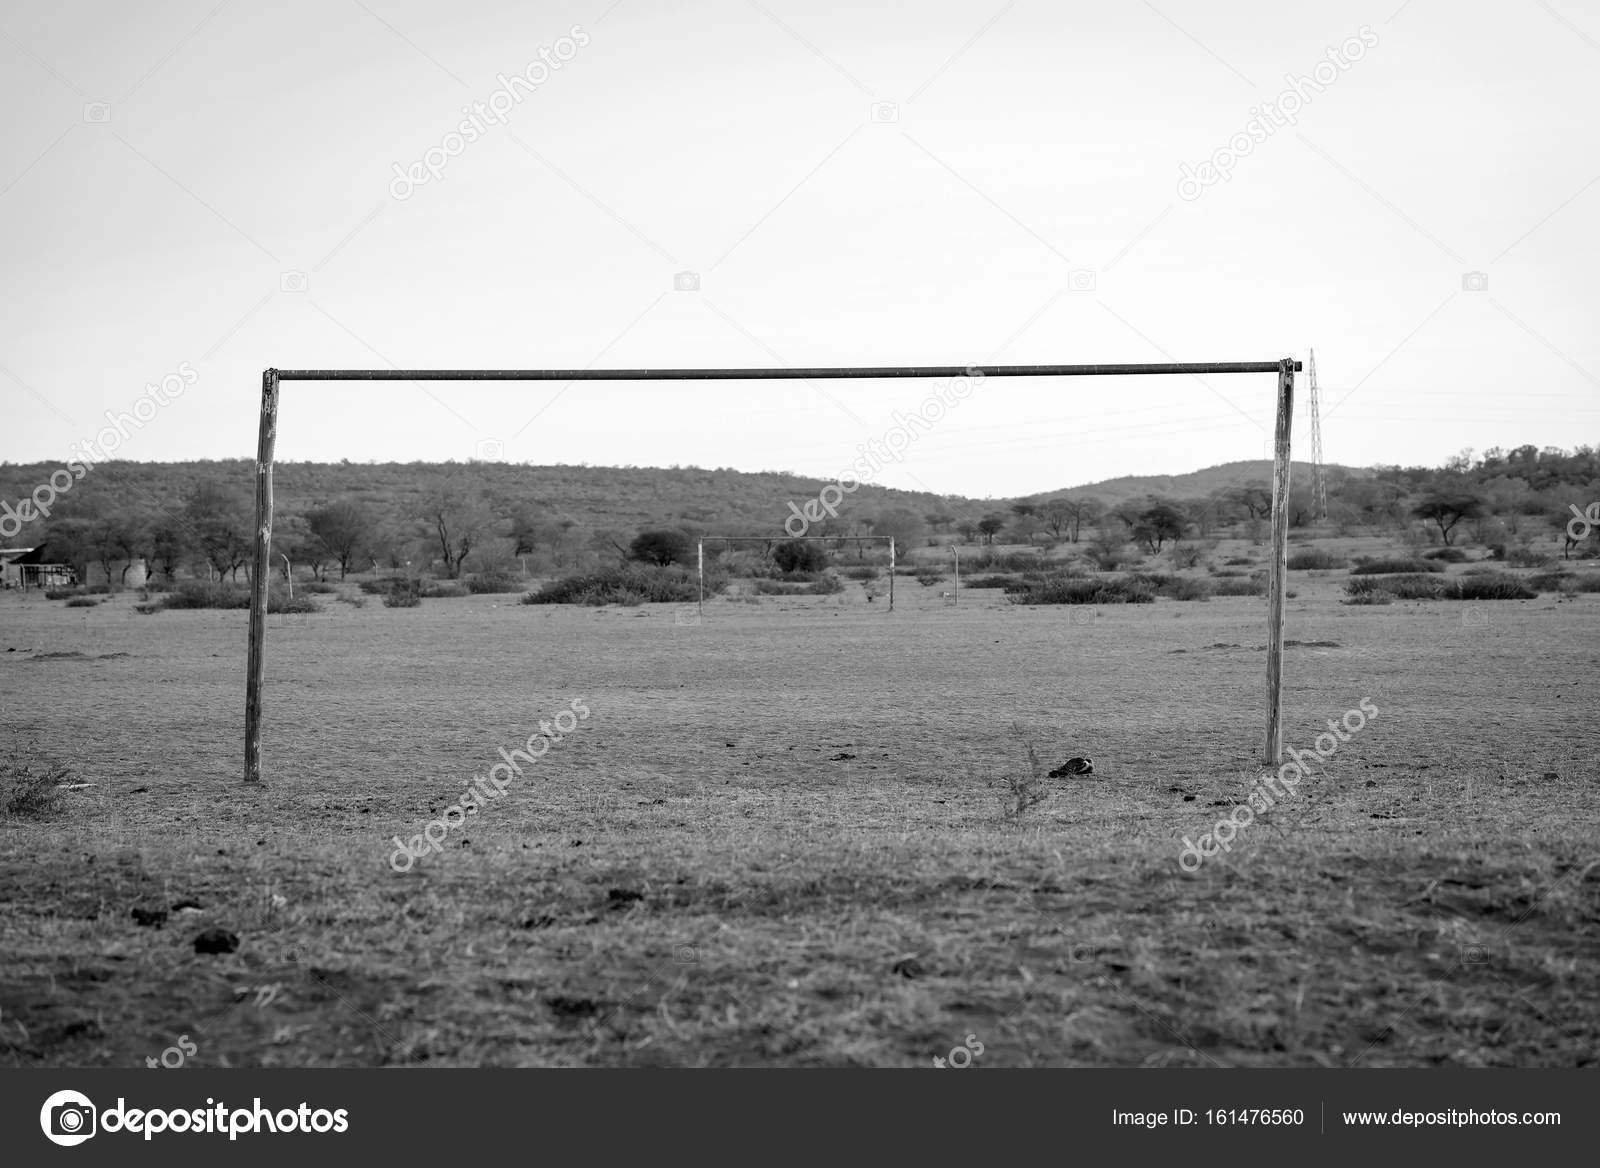 Afrikanischen Fussball Feld Schwarz Weiss Stockfoto